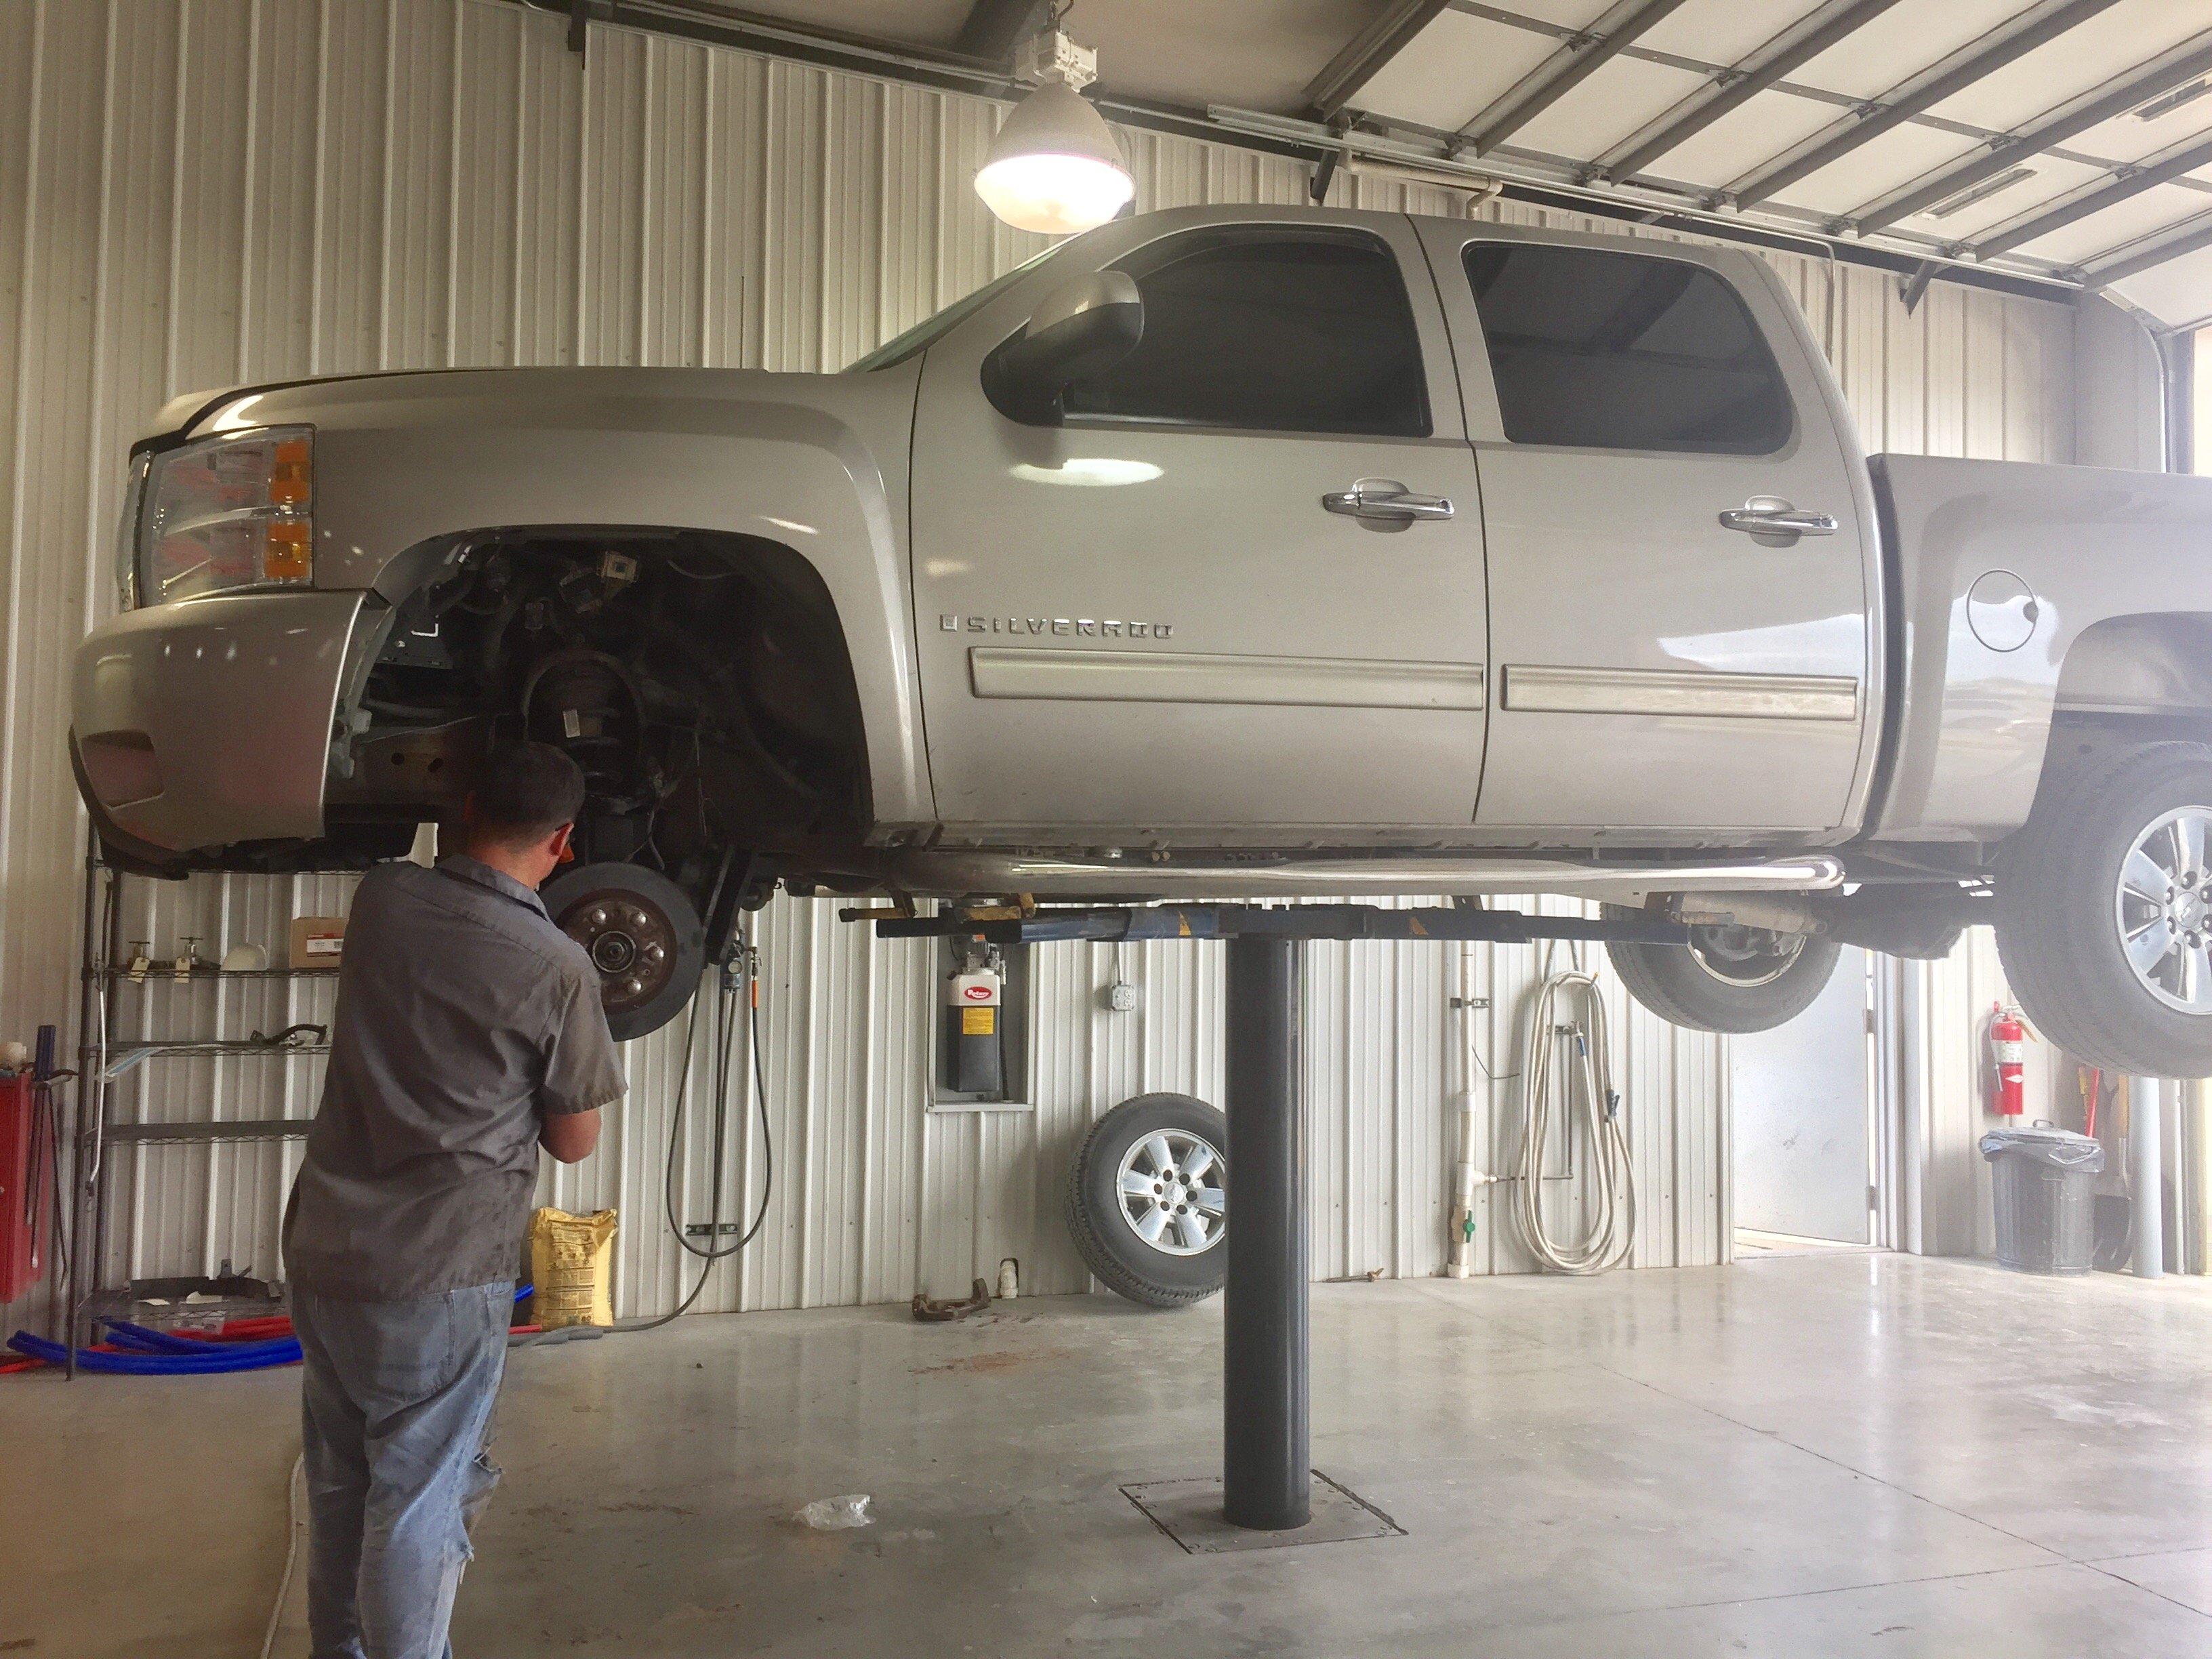 inside repair bay, grayish passenger truck on lift without tires, mechanic working on wheel